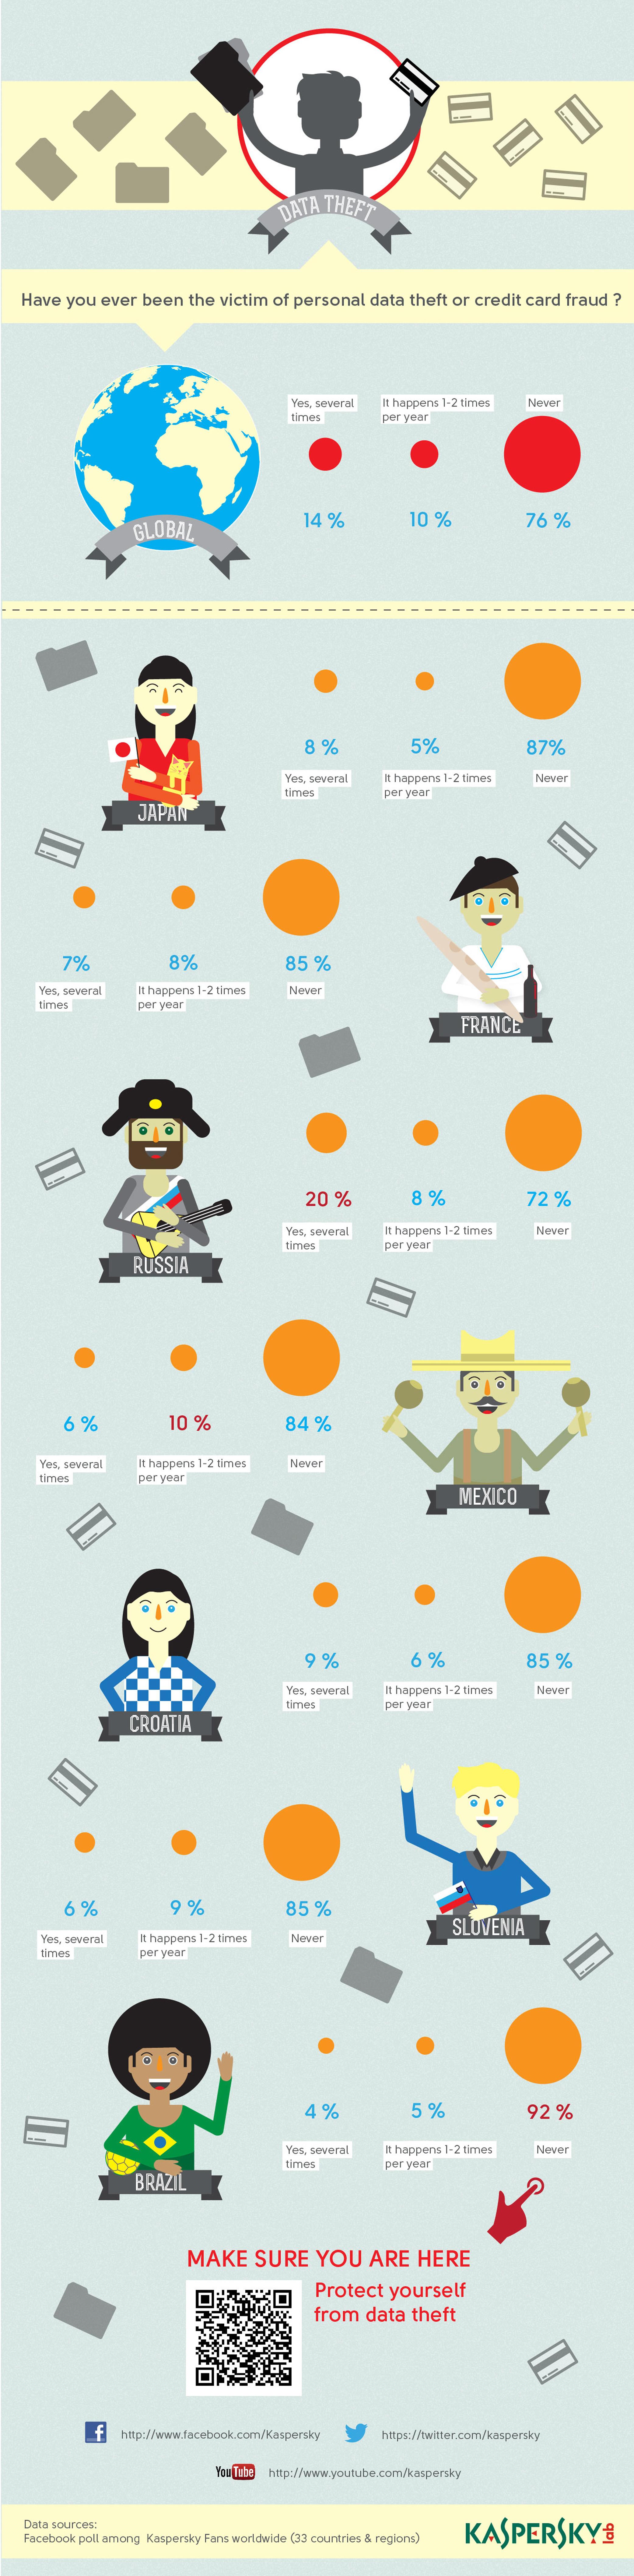 data theft infographic